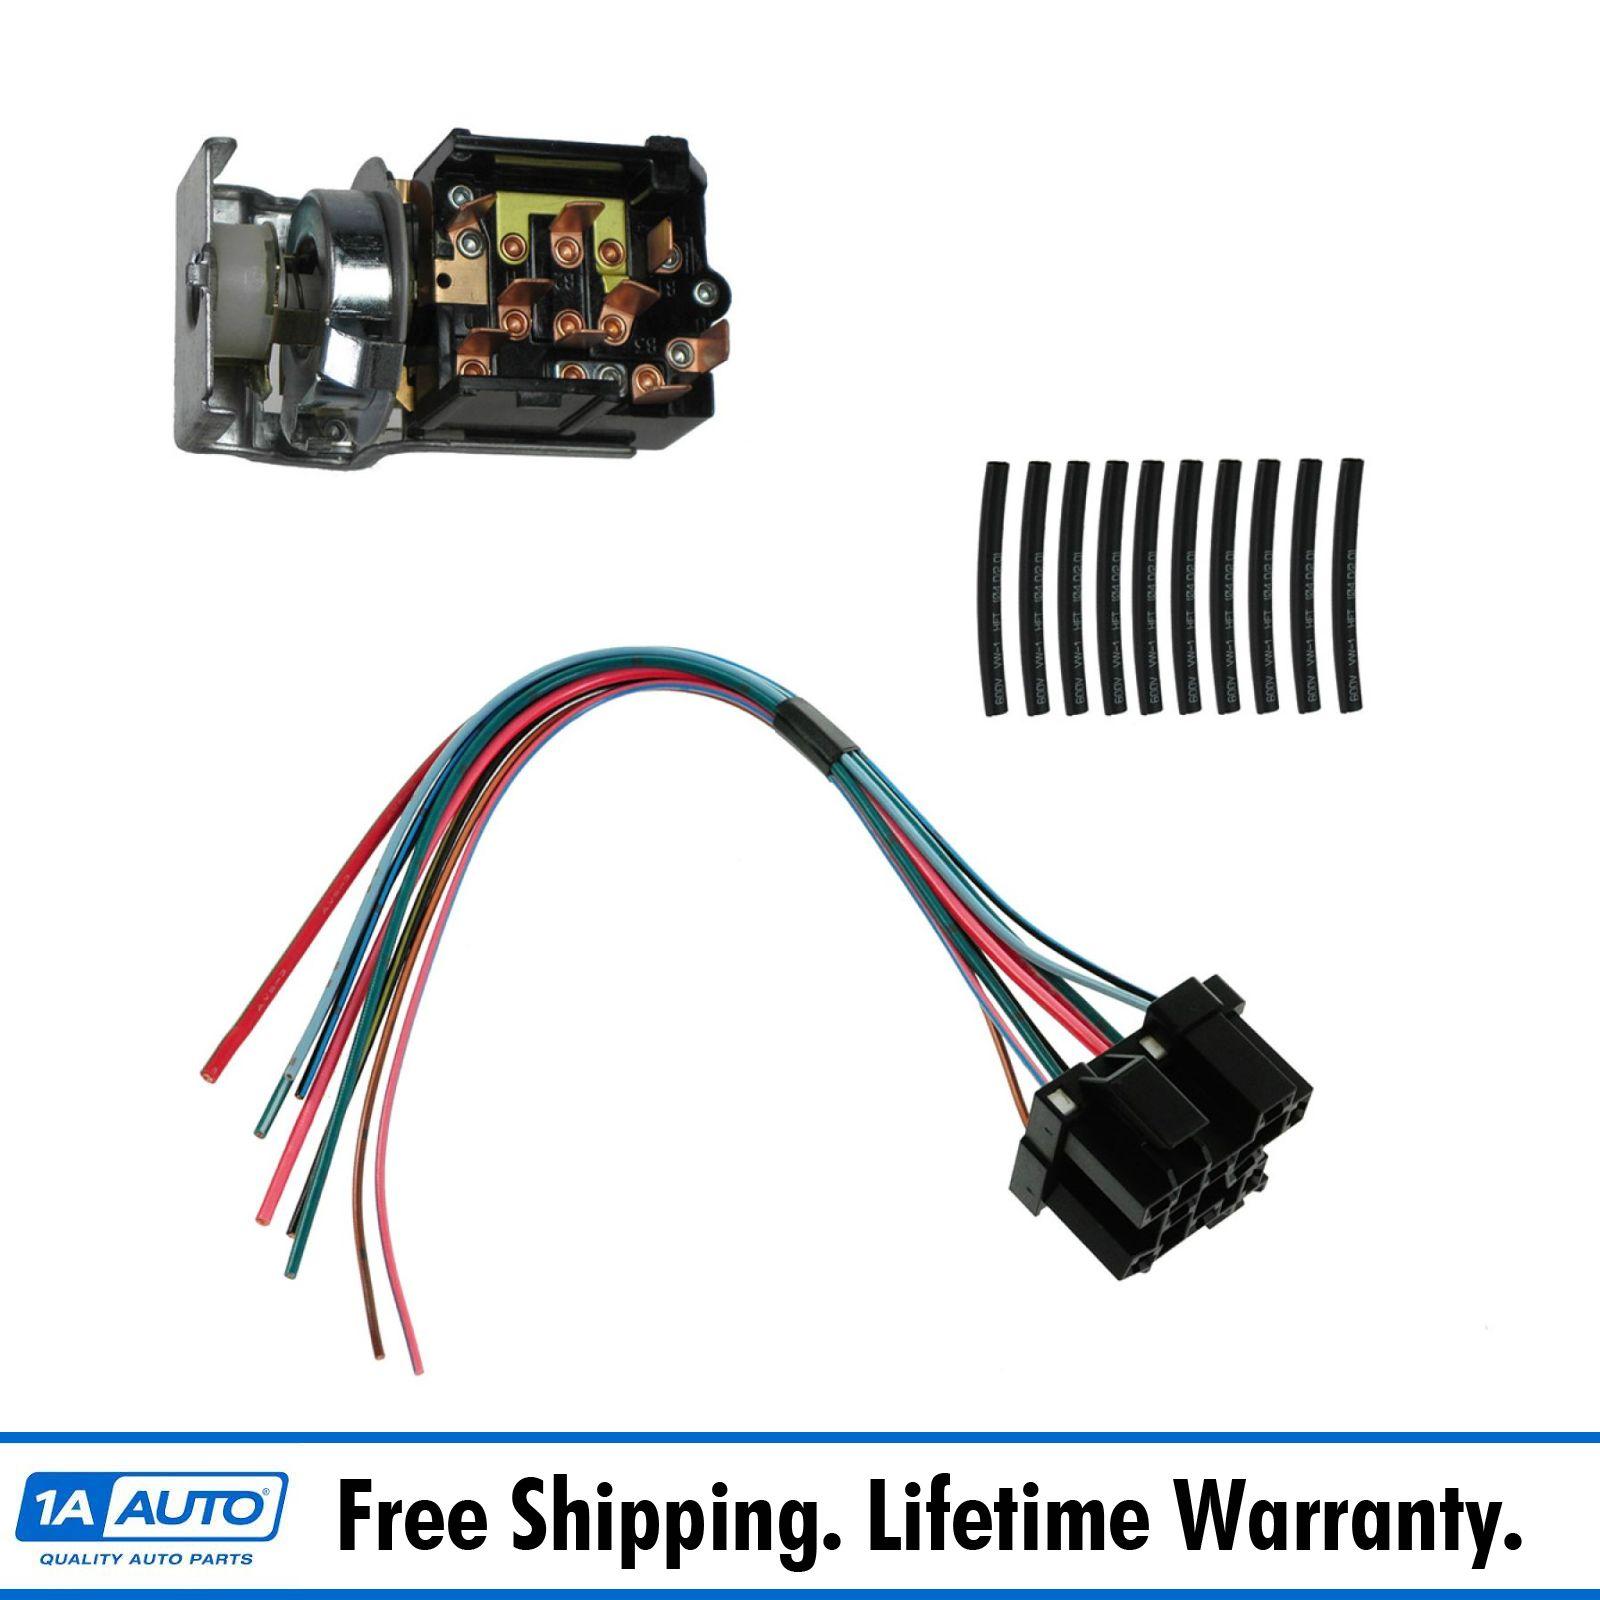 2001 dodge 2500 headlight wiring diagram reprap ram fuse box free engine image